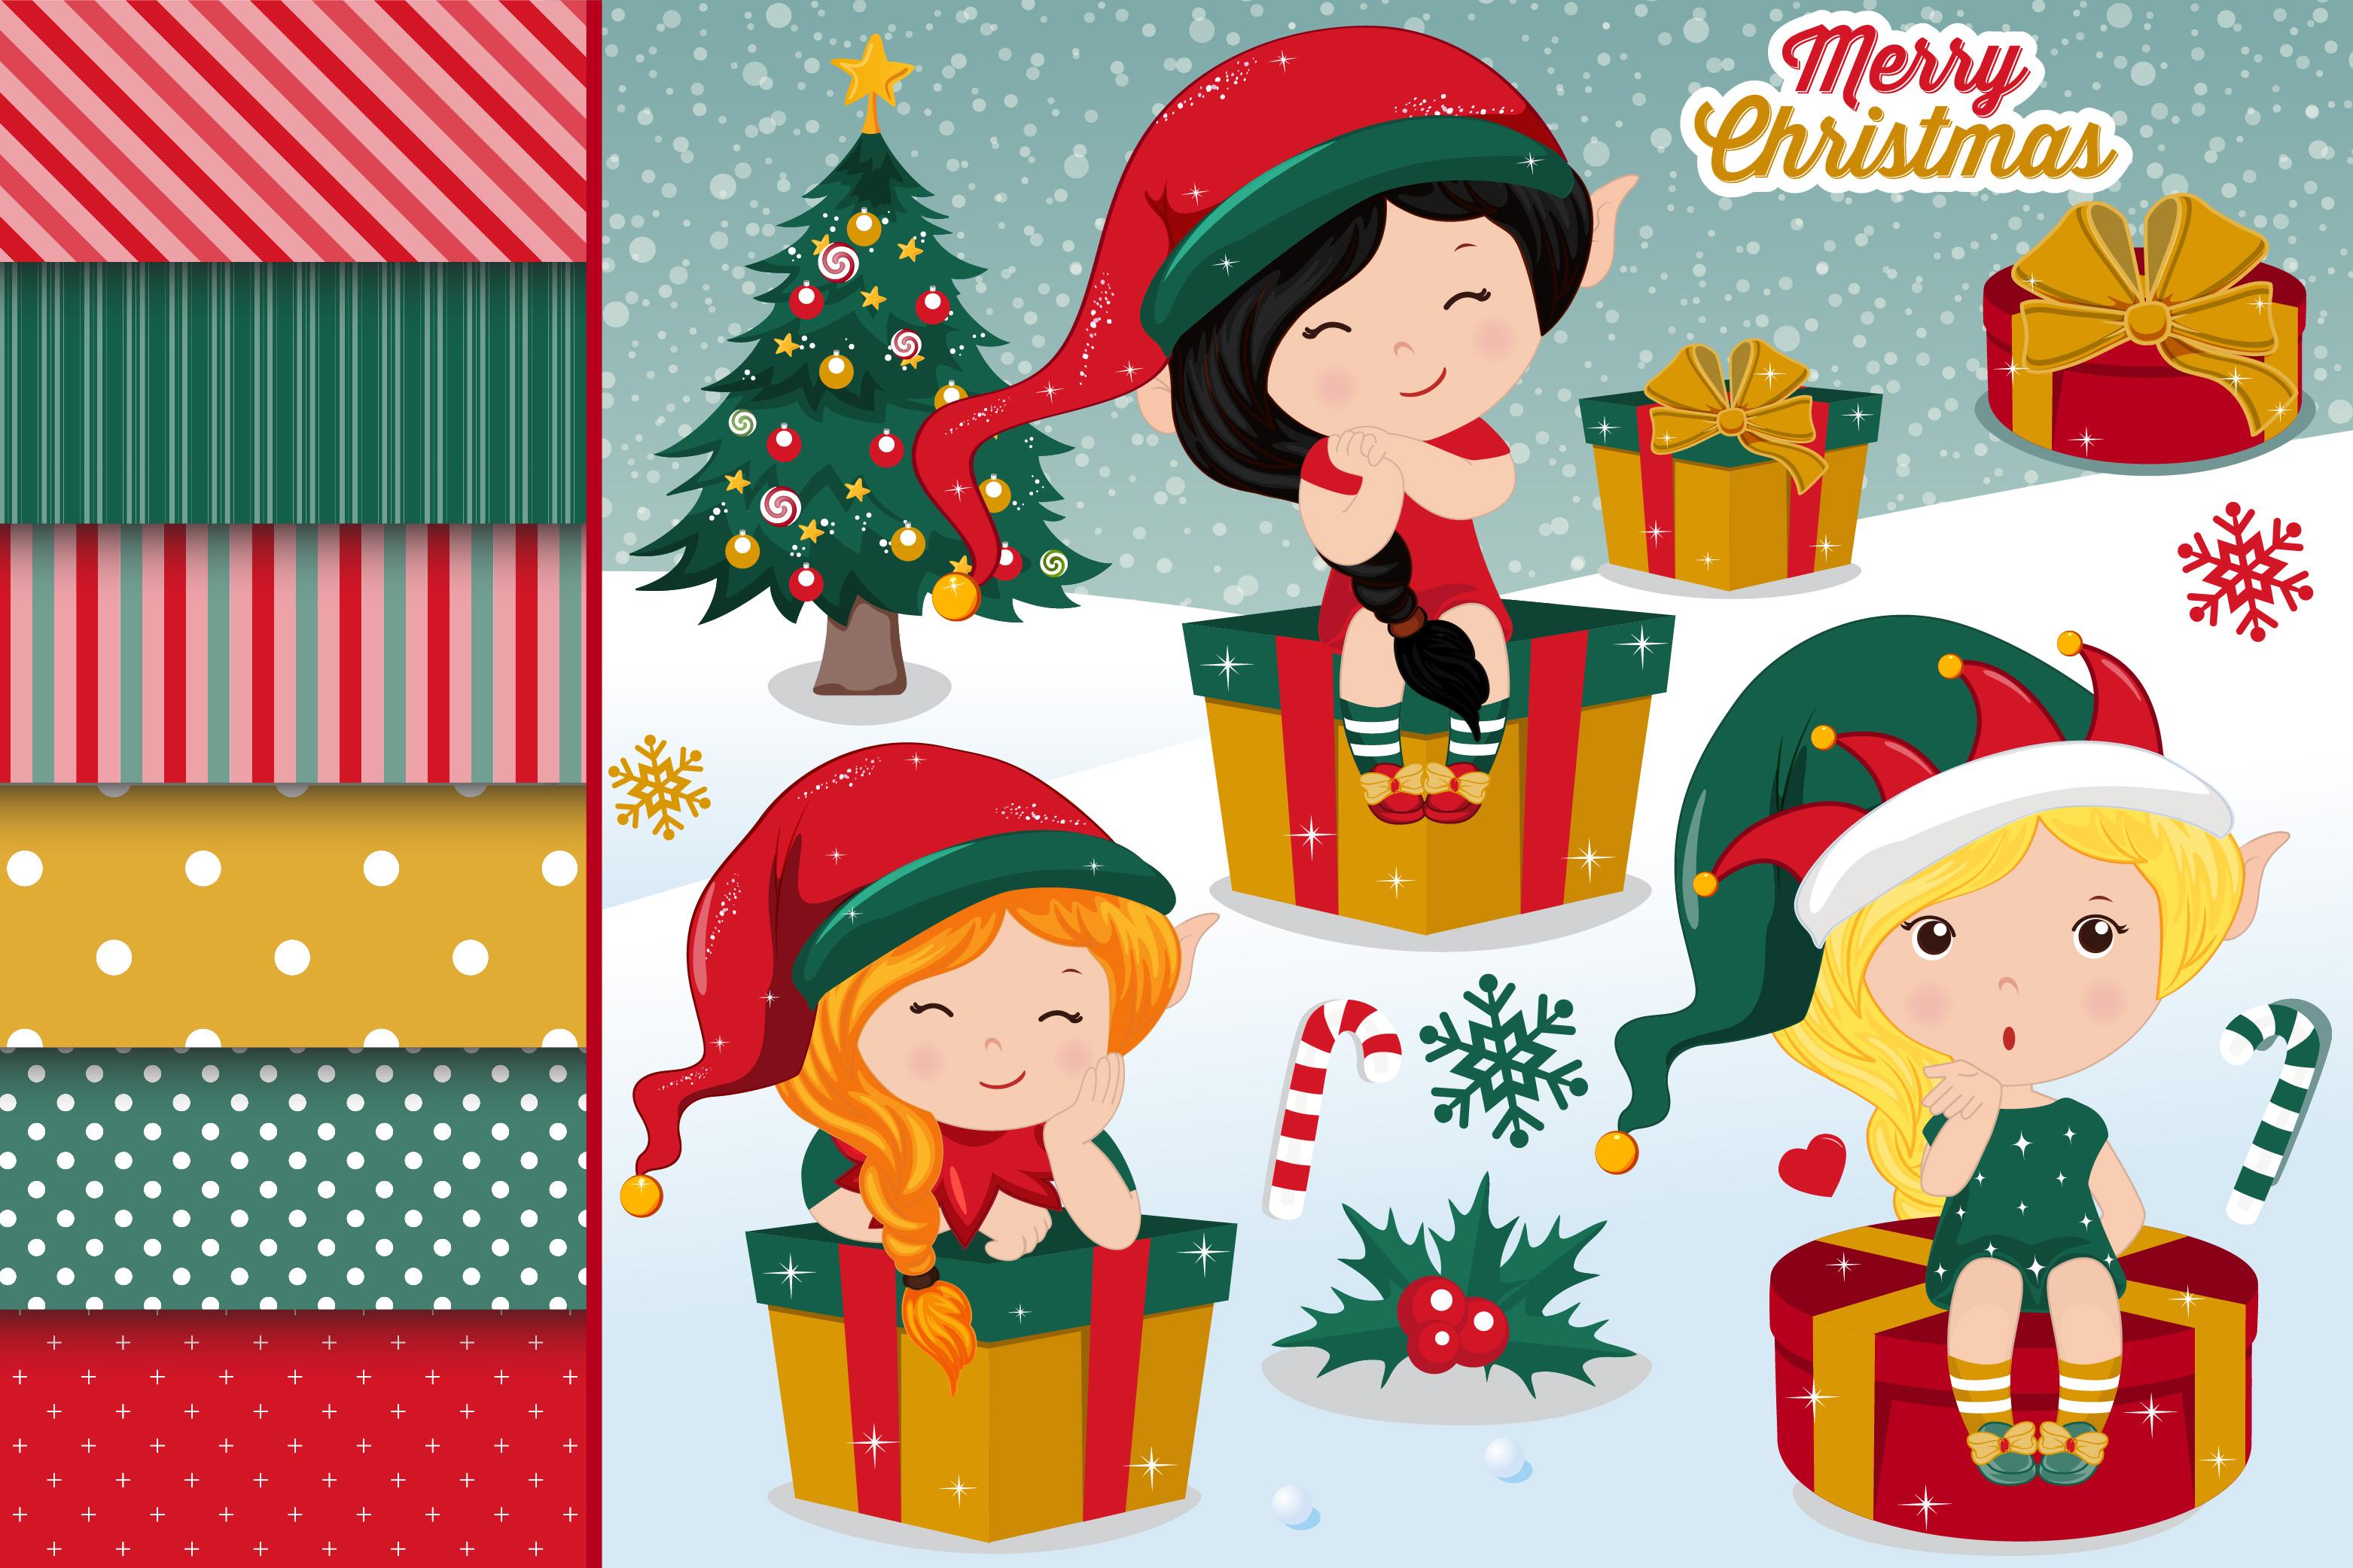 Christmas Elves Illustrations Christmas Elves Graphics